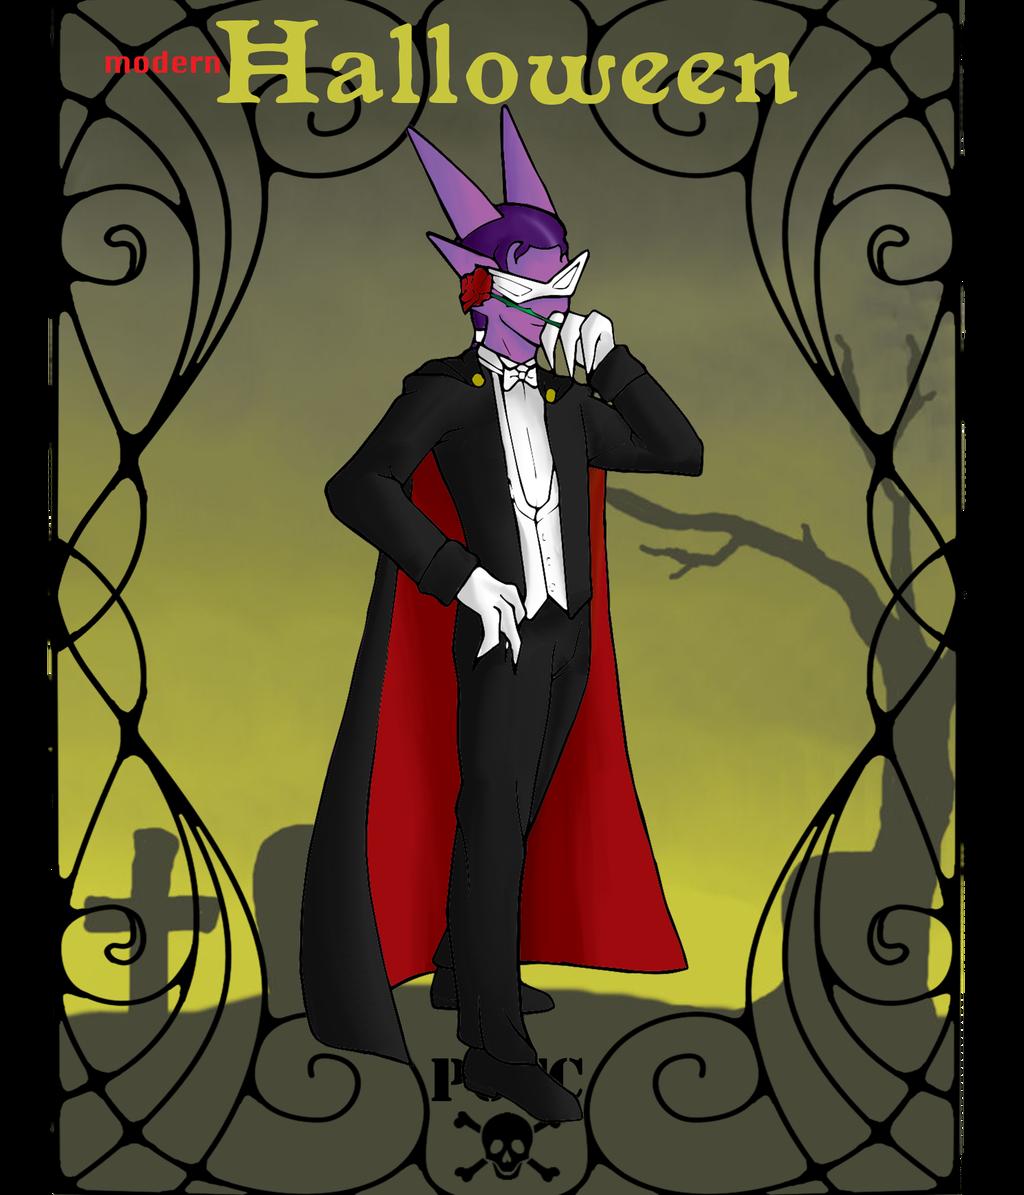 Modern Halloween Meme: Aspyn by DasherDoodle